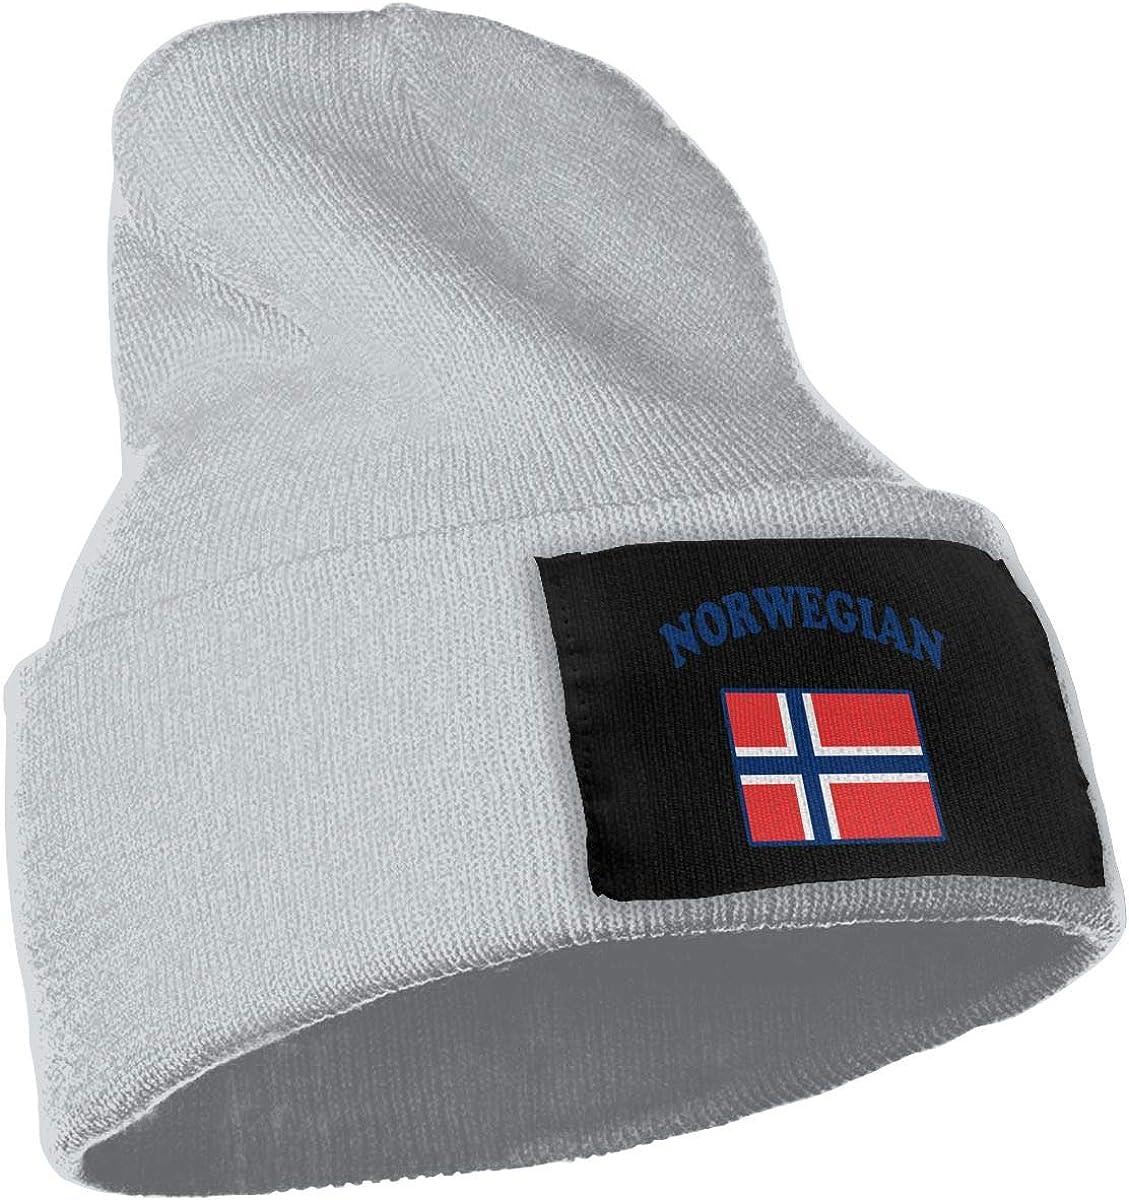 COLLJL-8 Unisex Norwegian Flag Outdoor Warm Knit Beanies Hat Soft Winter Knit Caps